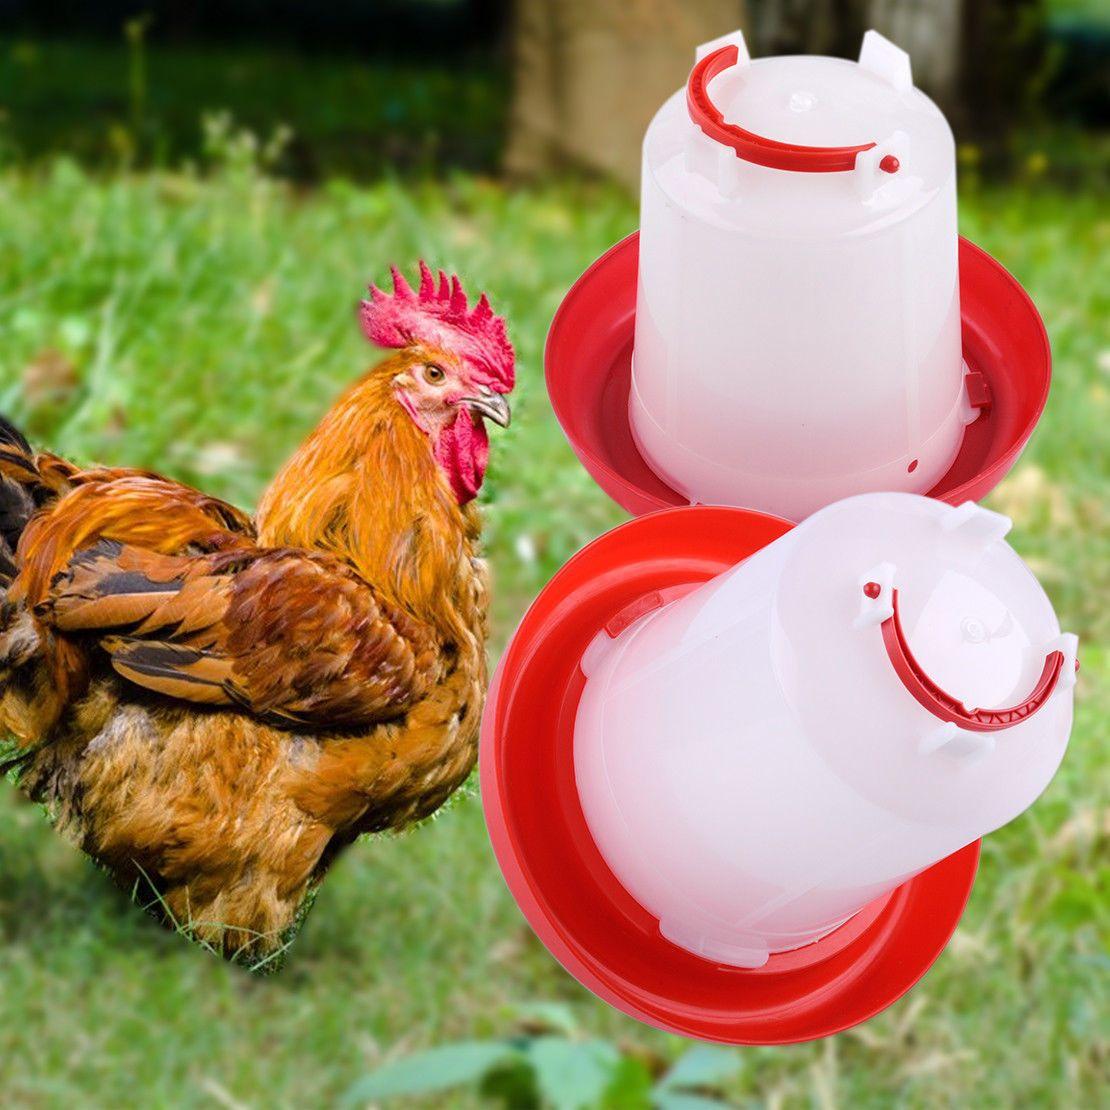 $2 99 - Plastic 1 5 L Chicken Quail Poultry Chick Hen